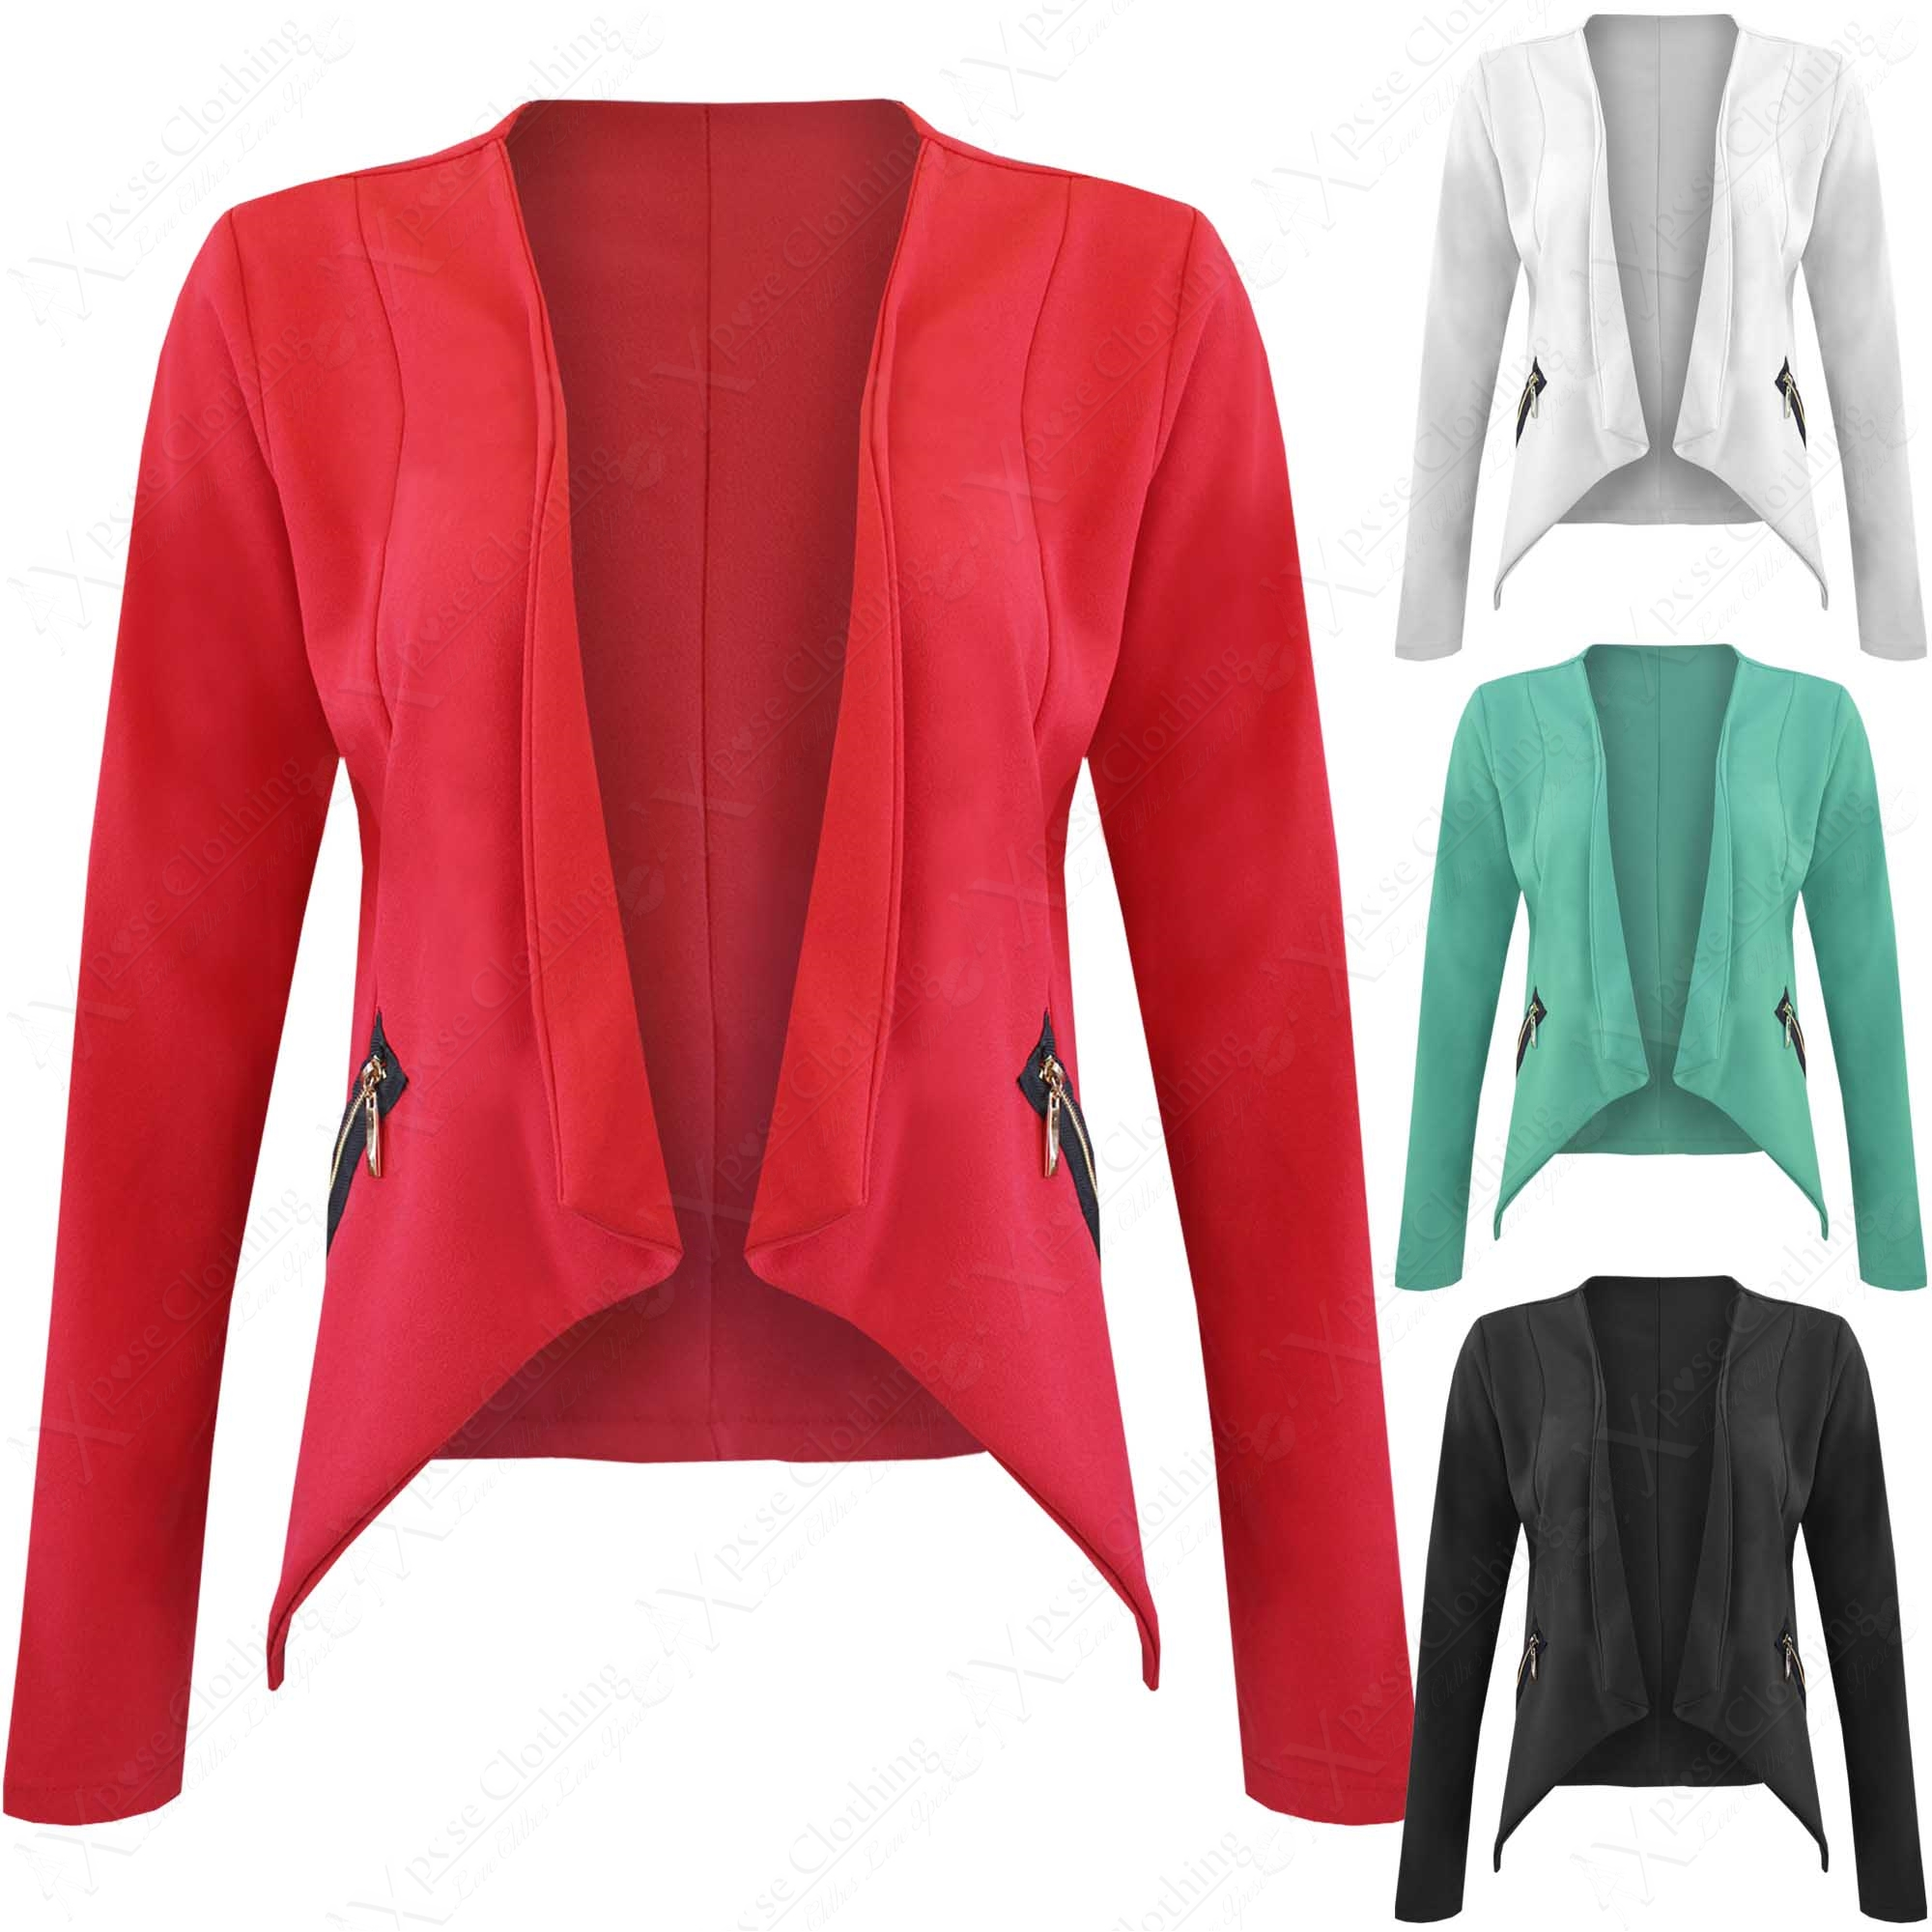 new ladies womens zip waterfall drape blazer long sleeve. Black Bedroom Furniture Sets. Home Design Ideas